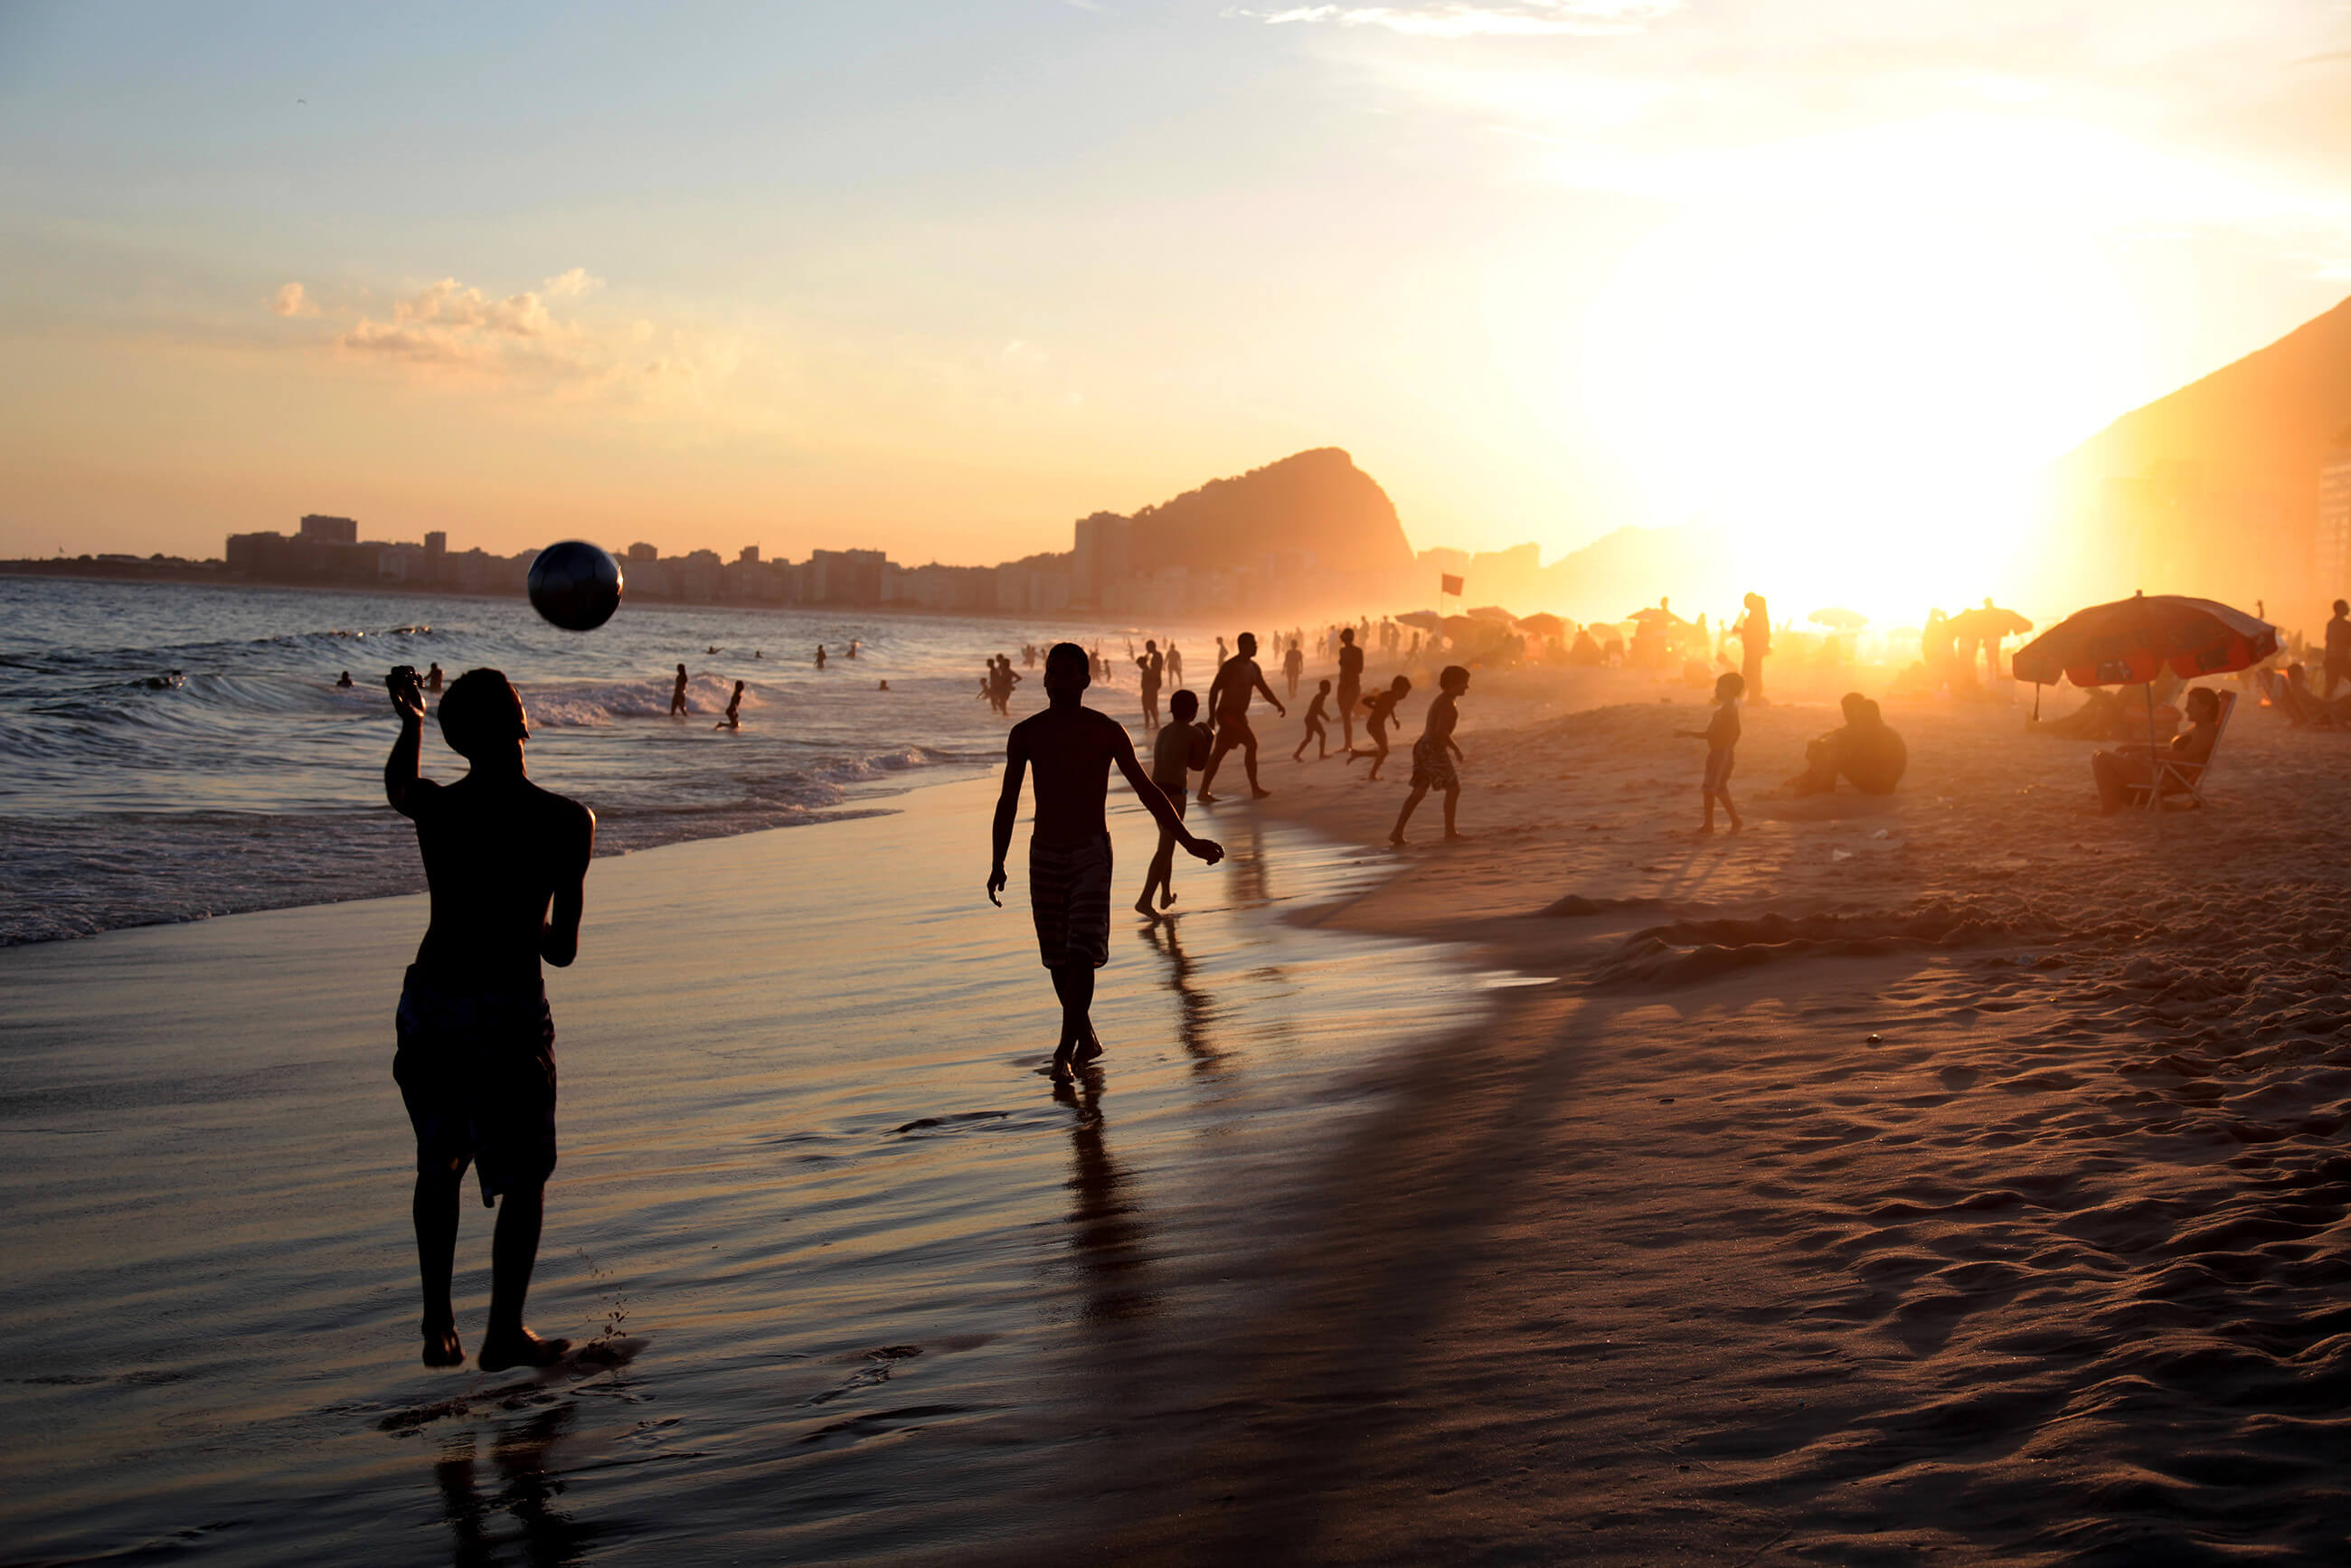 https://bubo.sk/uploads/galleries/5016/rio_copacabana3-1-.jpg